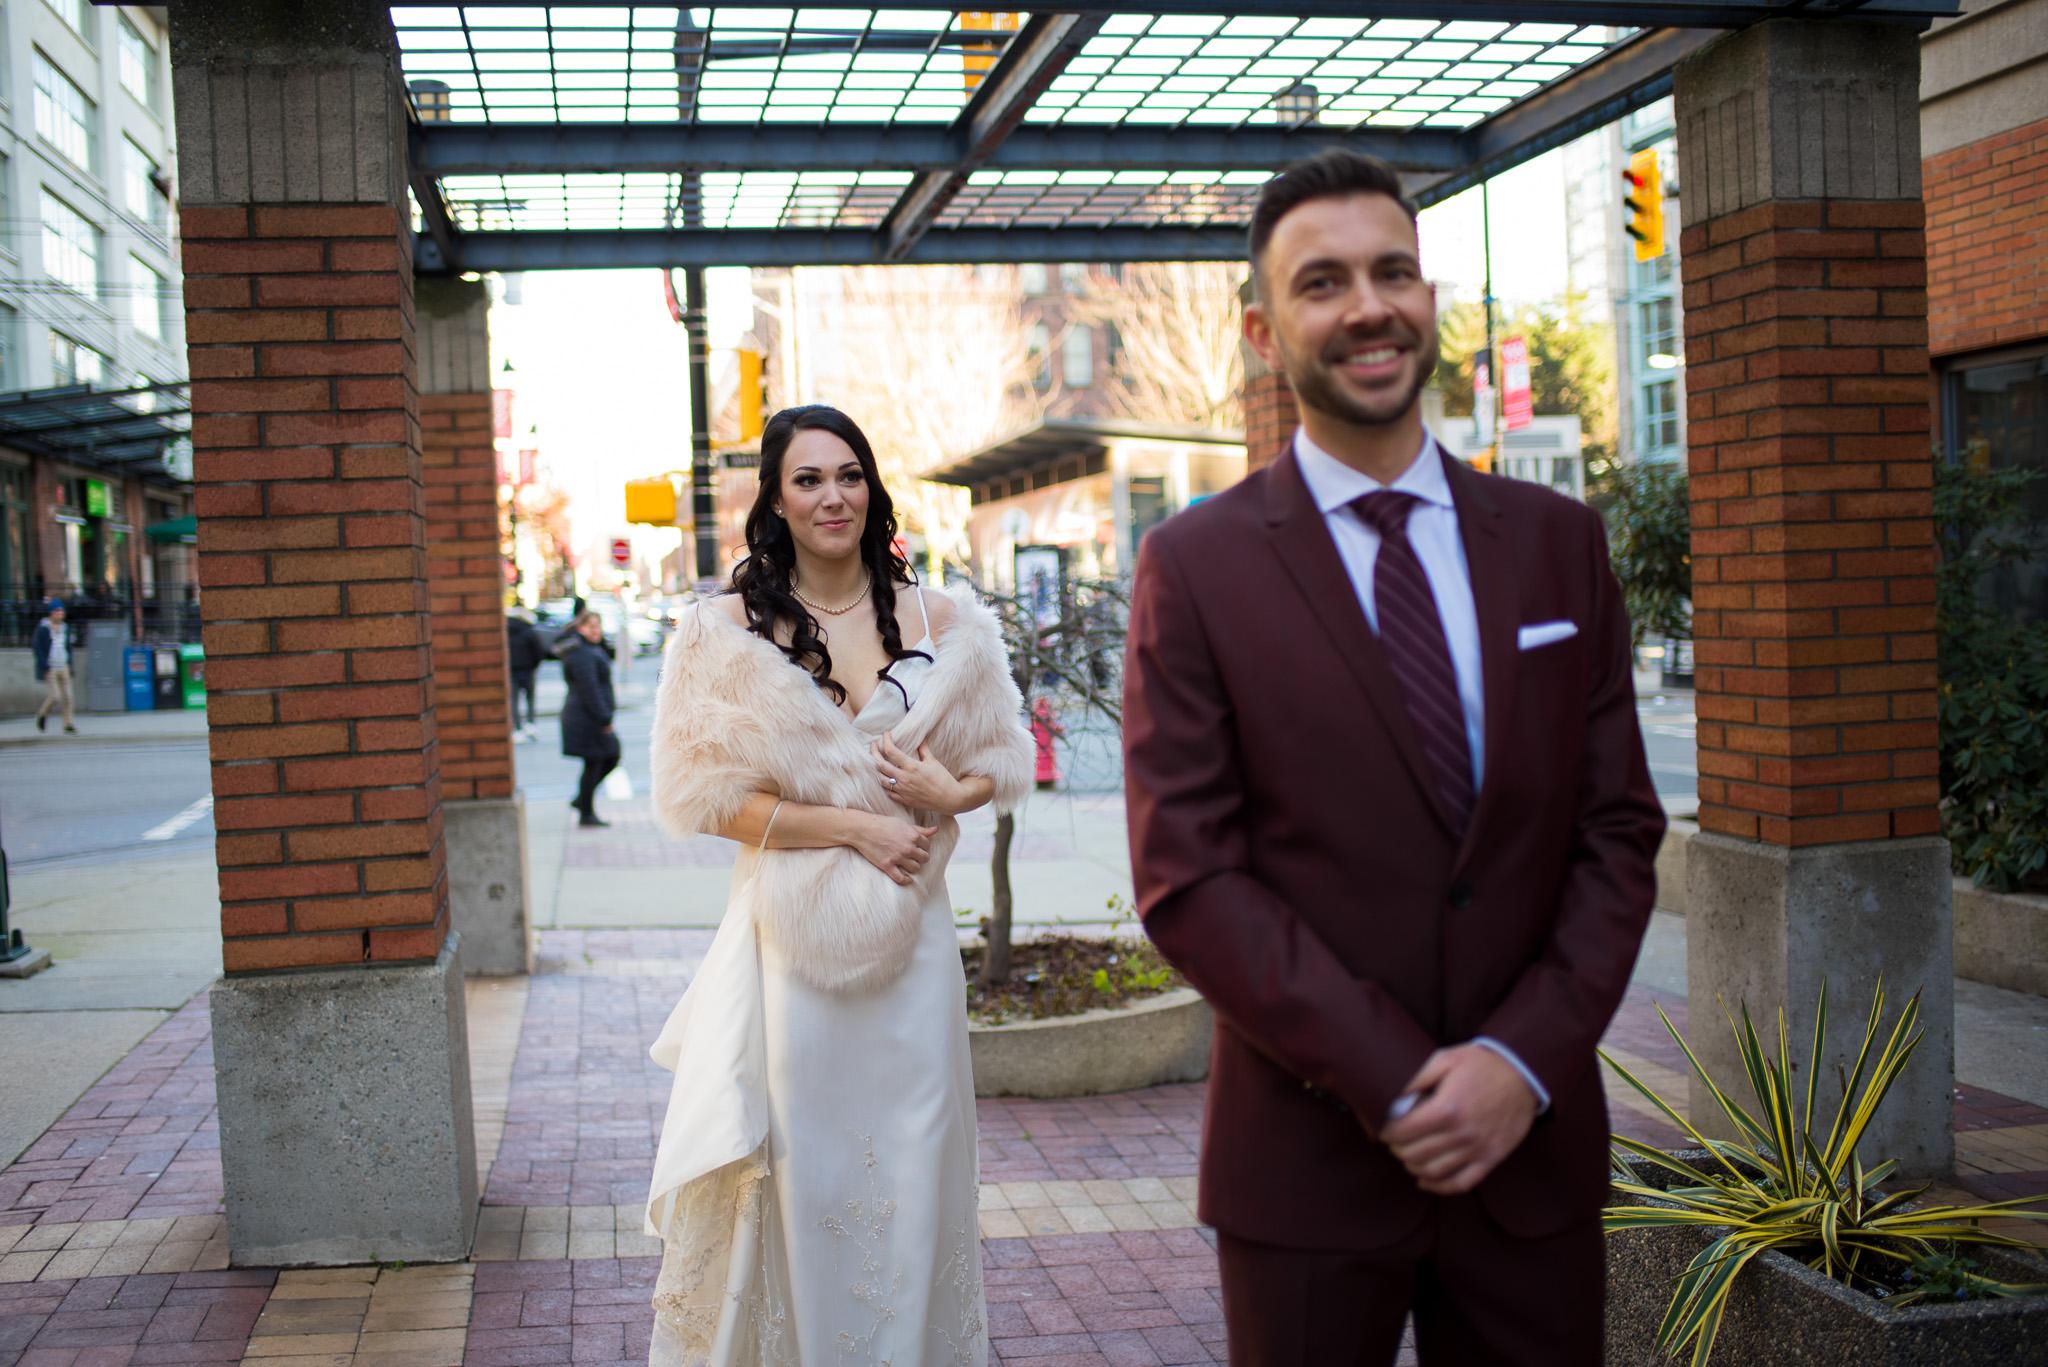 Brix and Mortar Wedding Photos-21.jpg